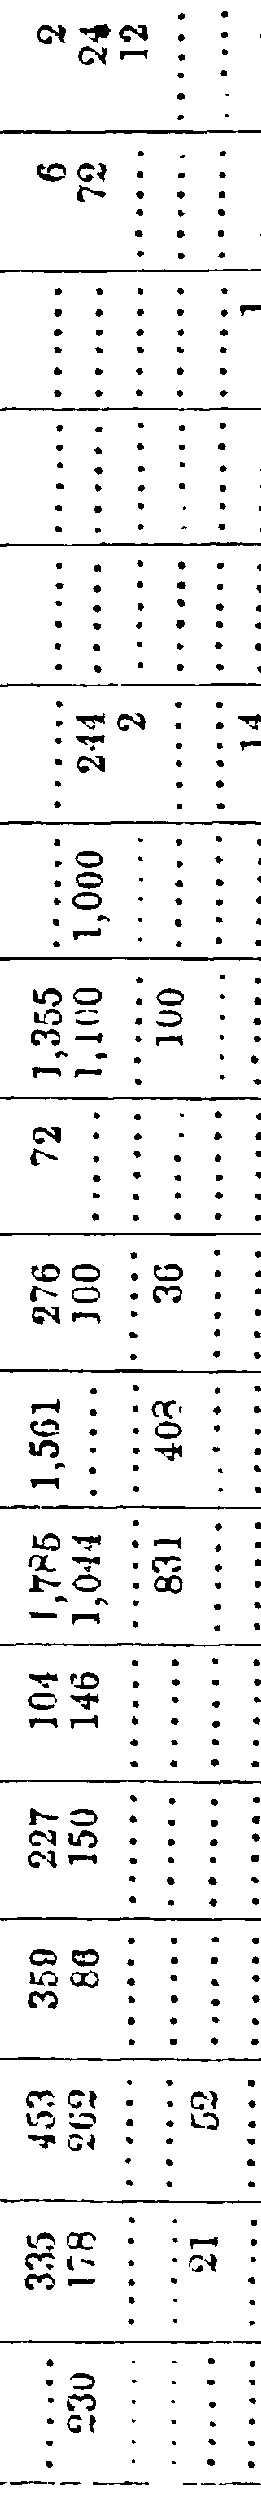 [merged small][merged small][merged small][merged small][merged small][merged small][merged small][merged small][merged small][merged small][merged small][merged small][ocr errors][merged small][merged small][merged small][merged small][merged small][merged small][ocr errors][ocr errors][ocr errors][ocr errors]